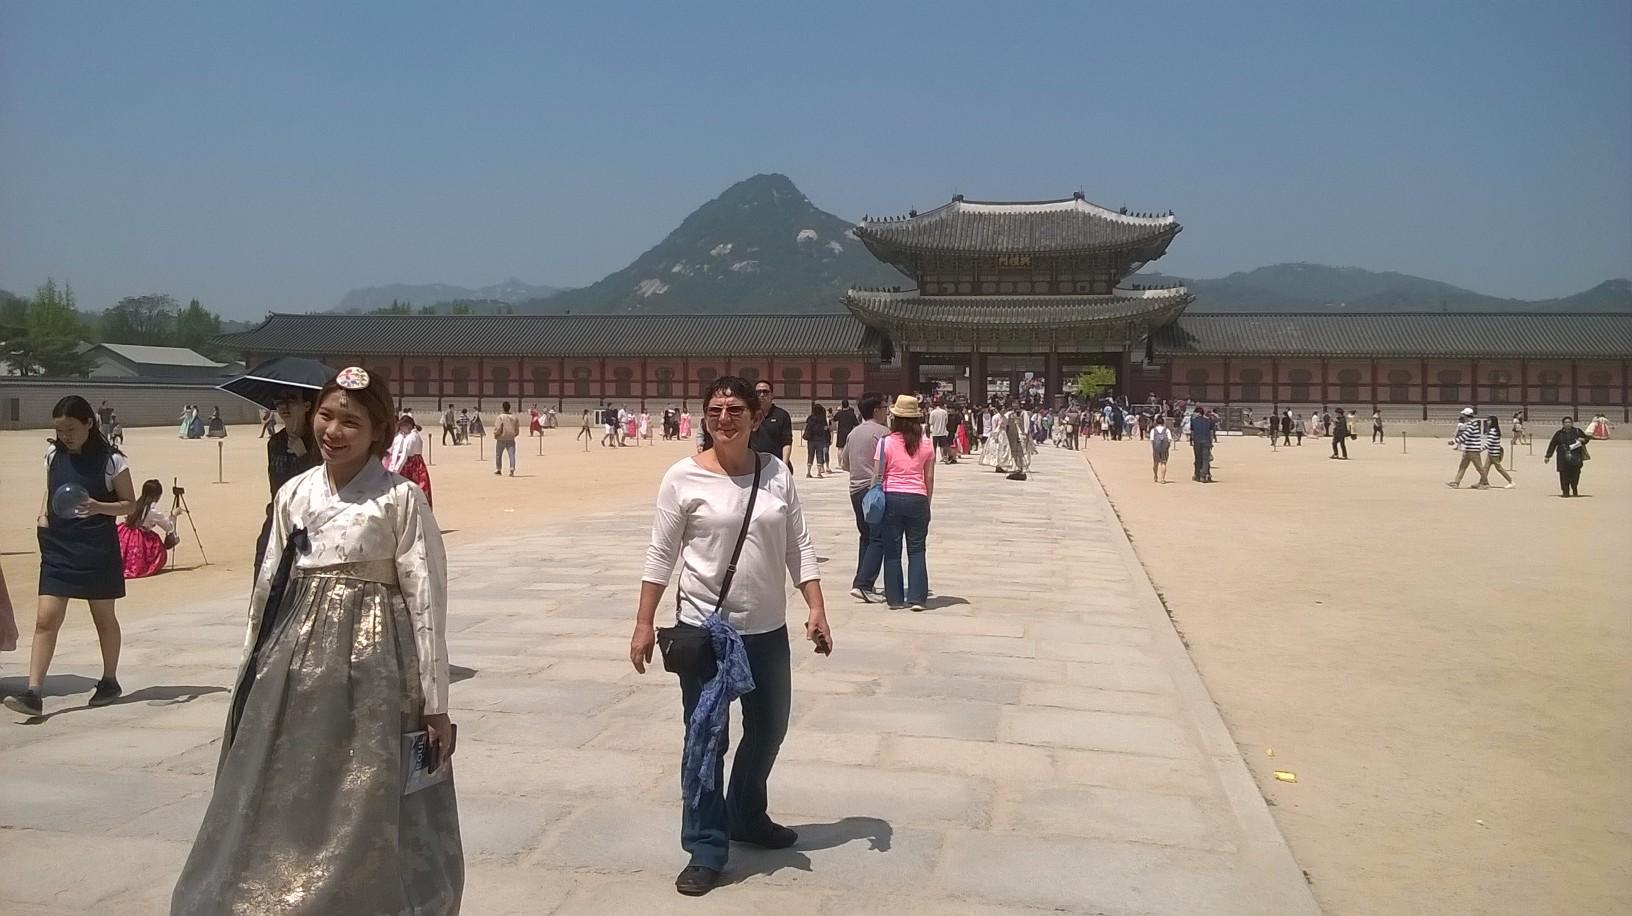 At the Royal Gyeongbokgung Palace with local tourist wearing a hanbok